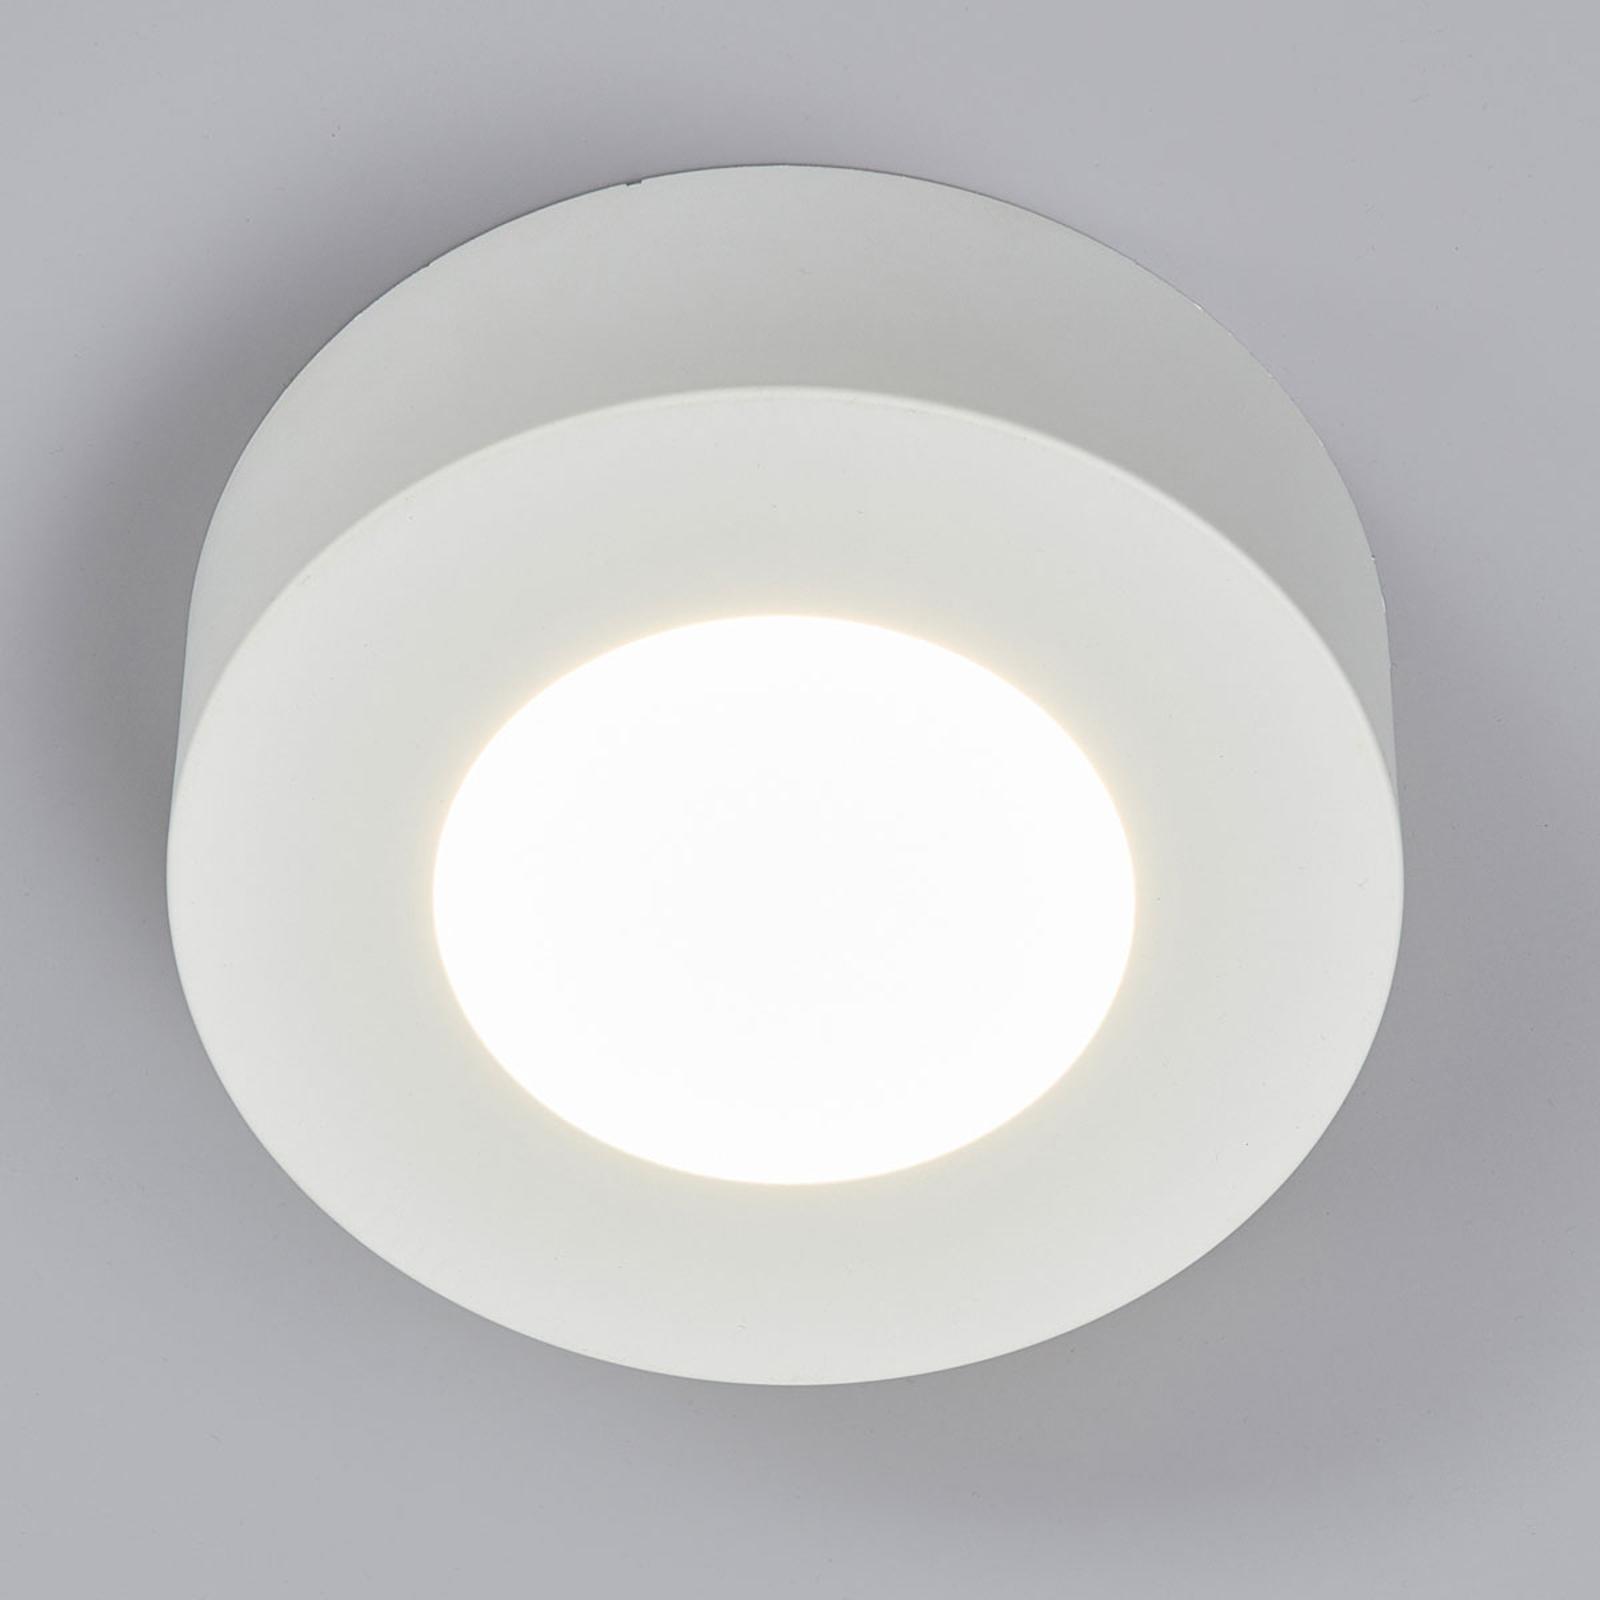 LED plafondlamp Marlo wit 4.000K rond 12,8 cm